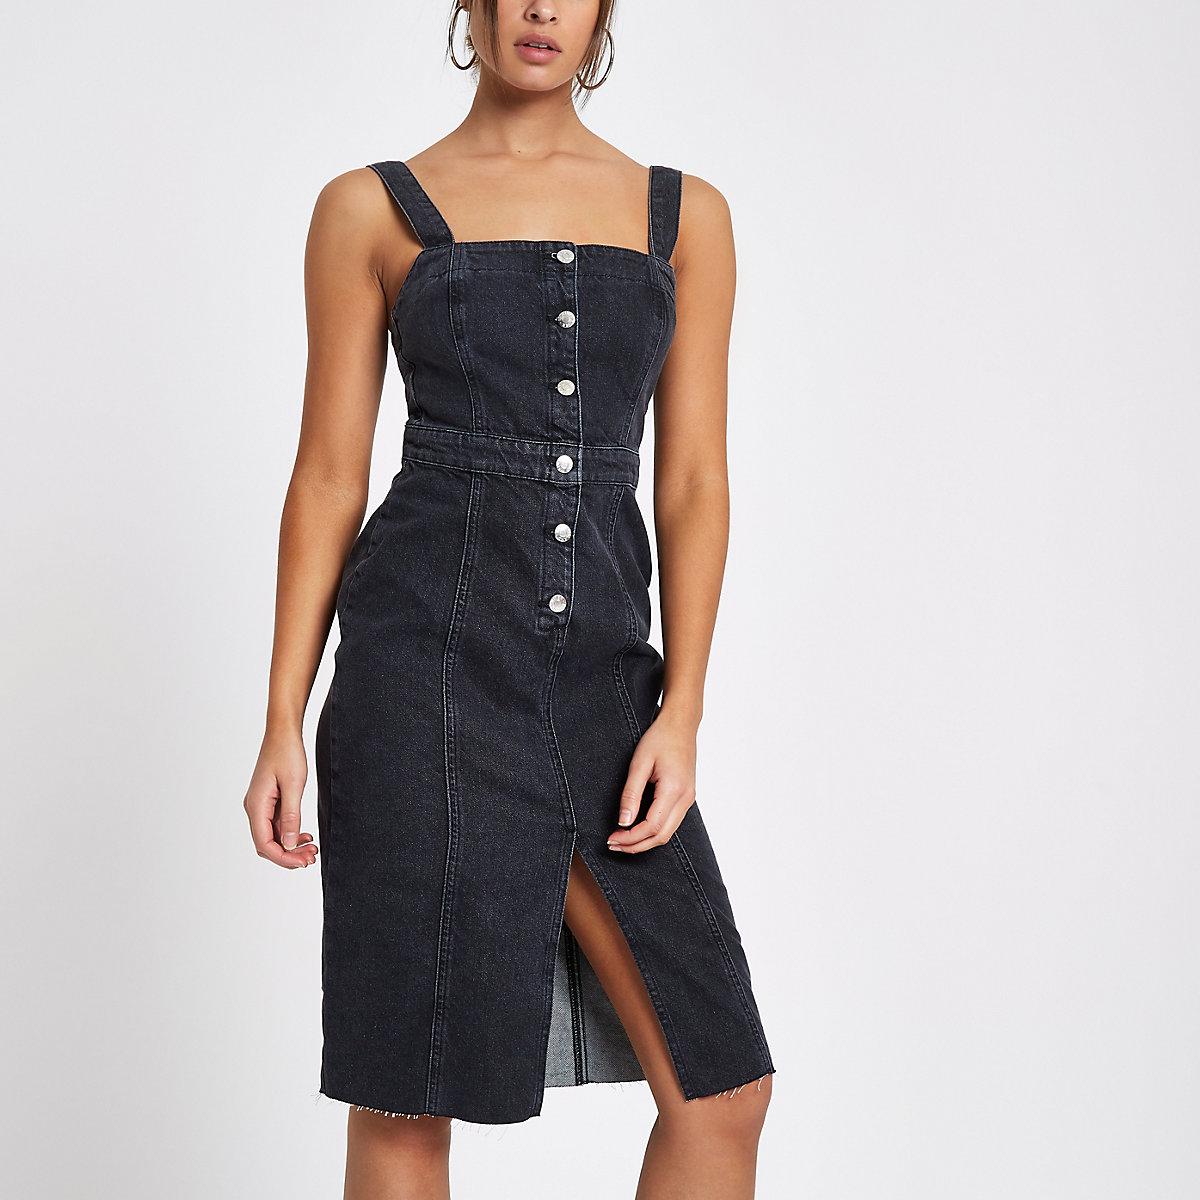 Black fitted button down denim midi dress